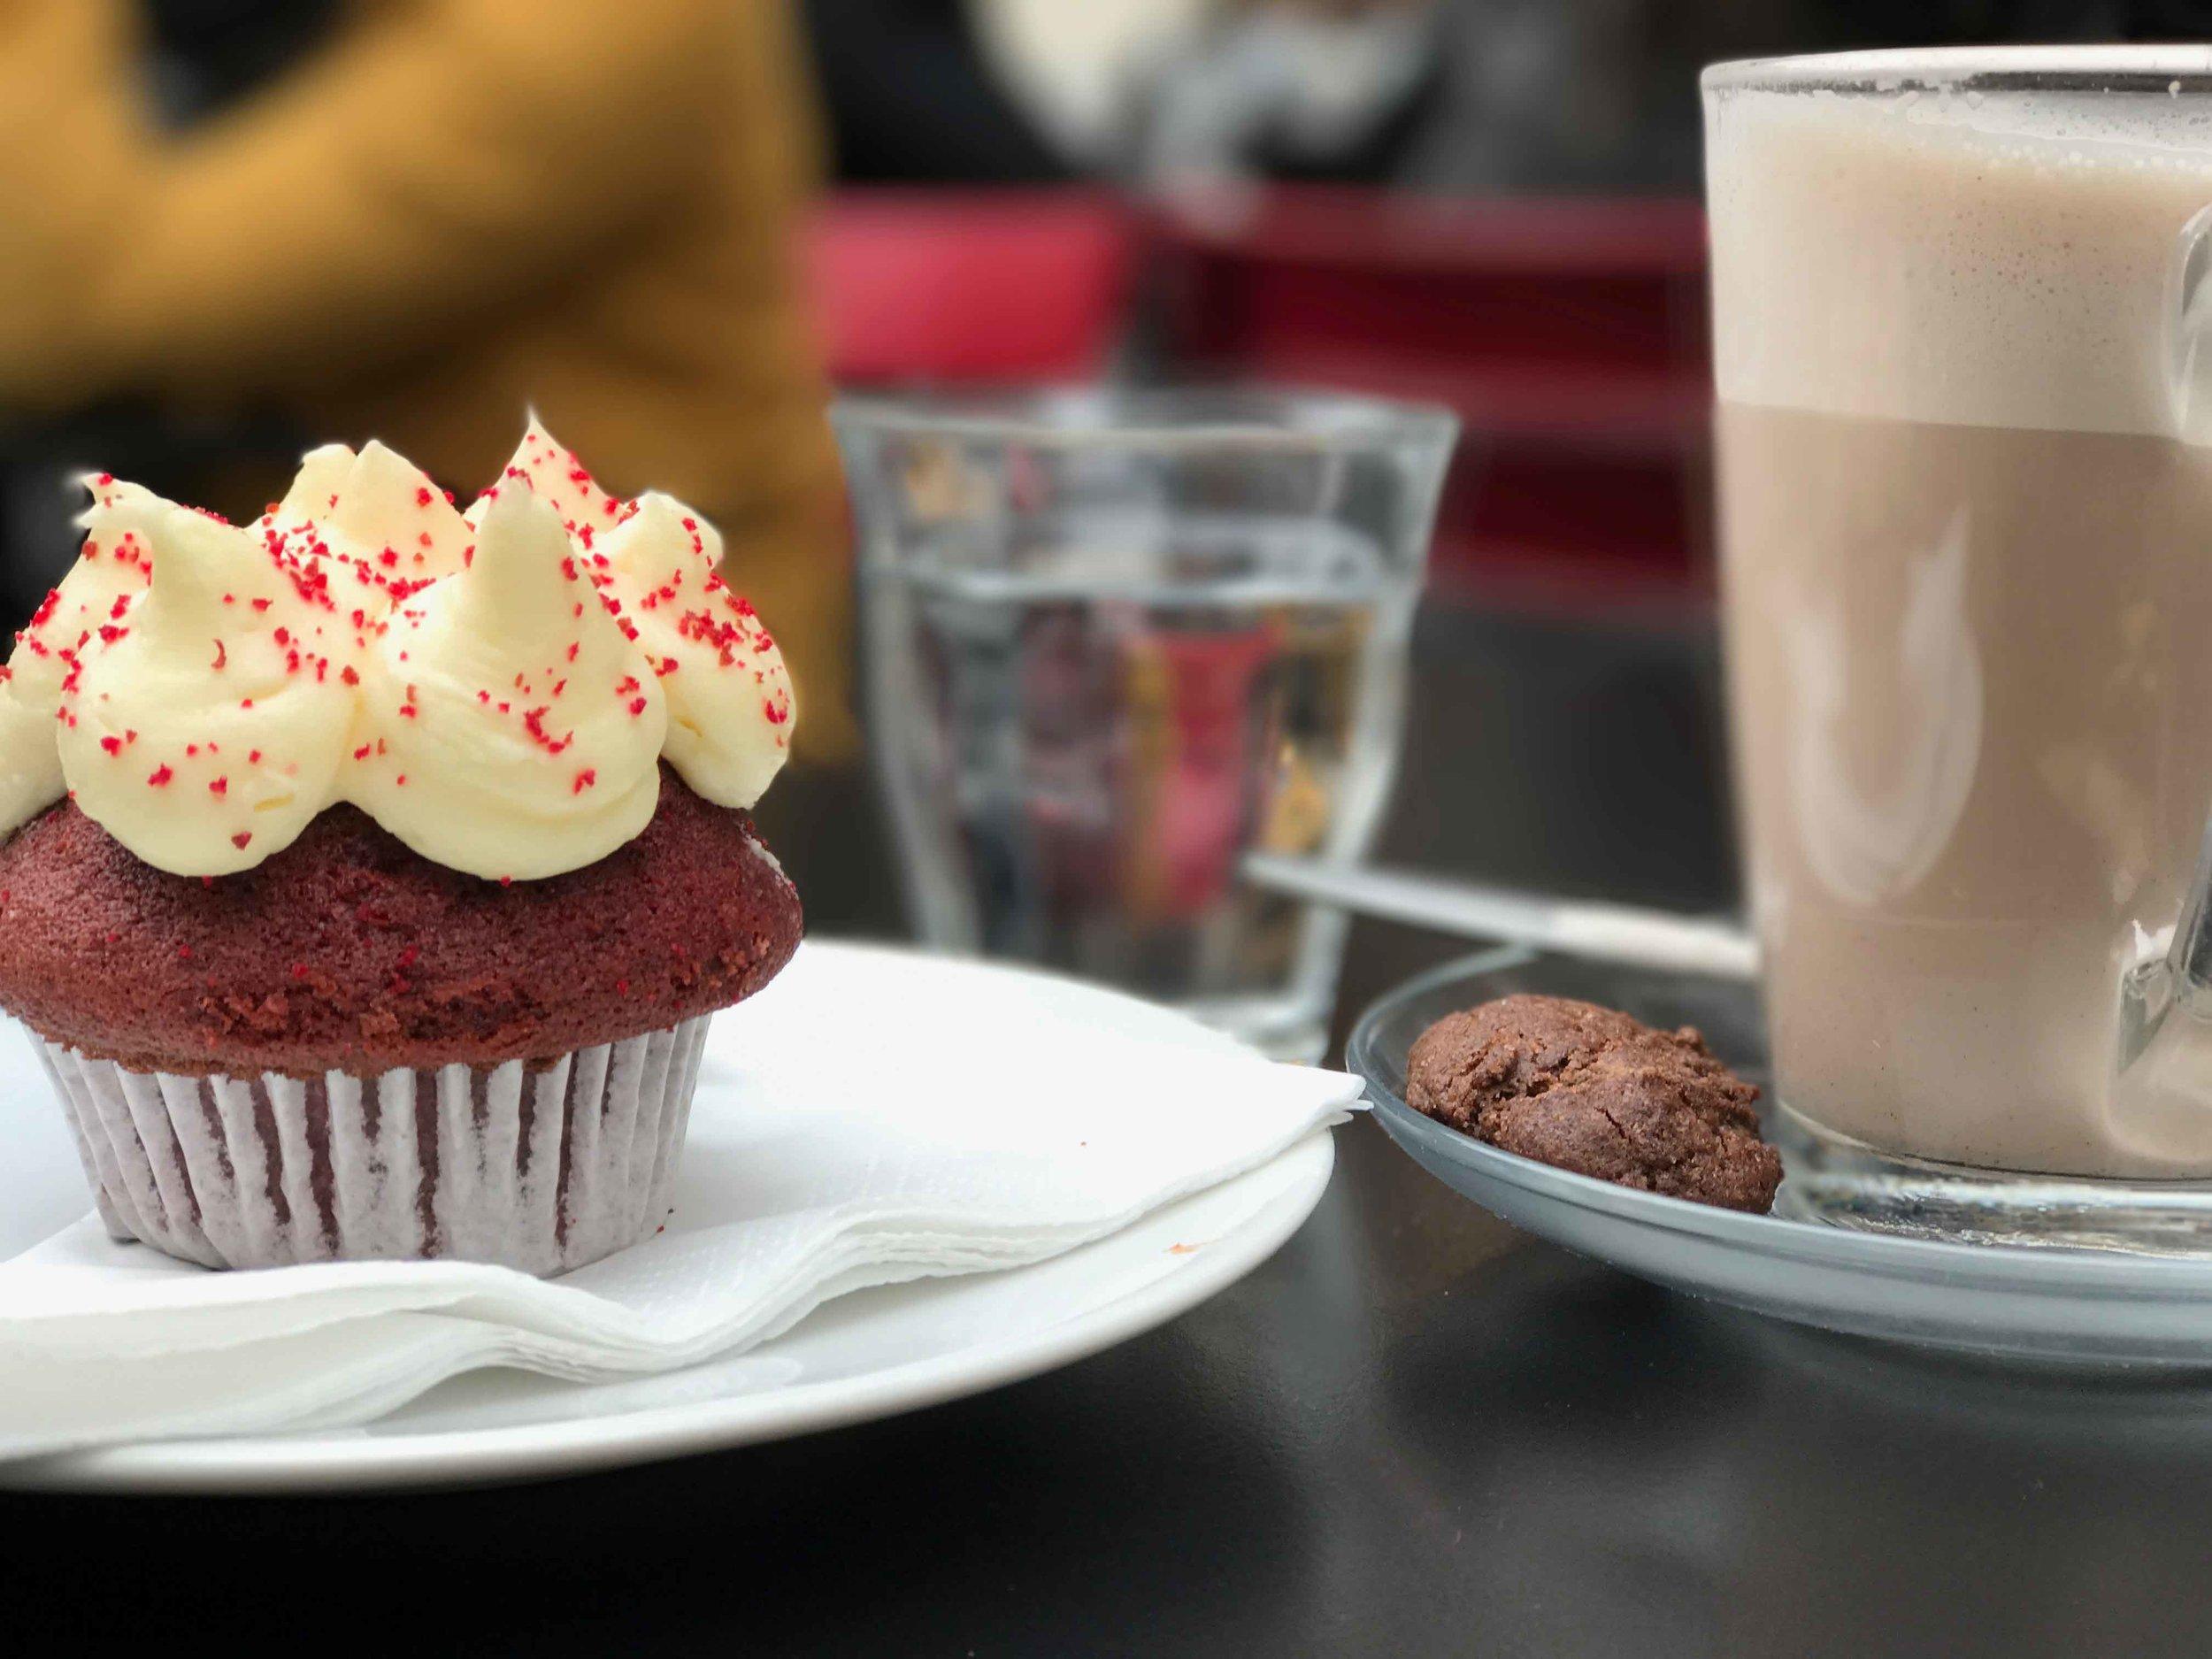 Red velvet cake,De Drie Graefjes, Dam Square, Amsterdam. Photo: Fabio Ricci. Image©thingstodot.com